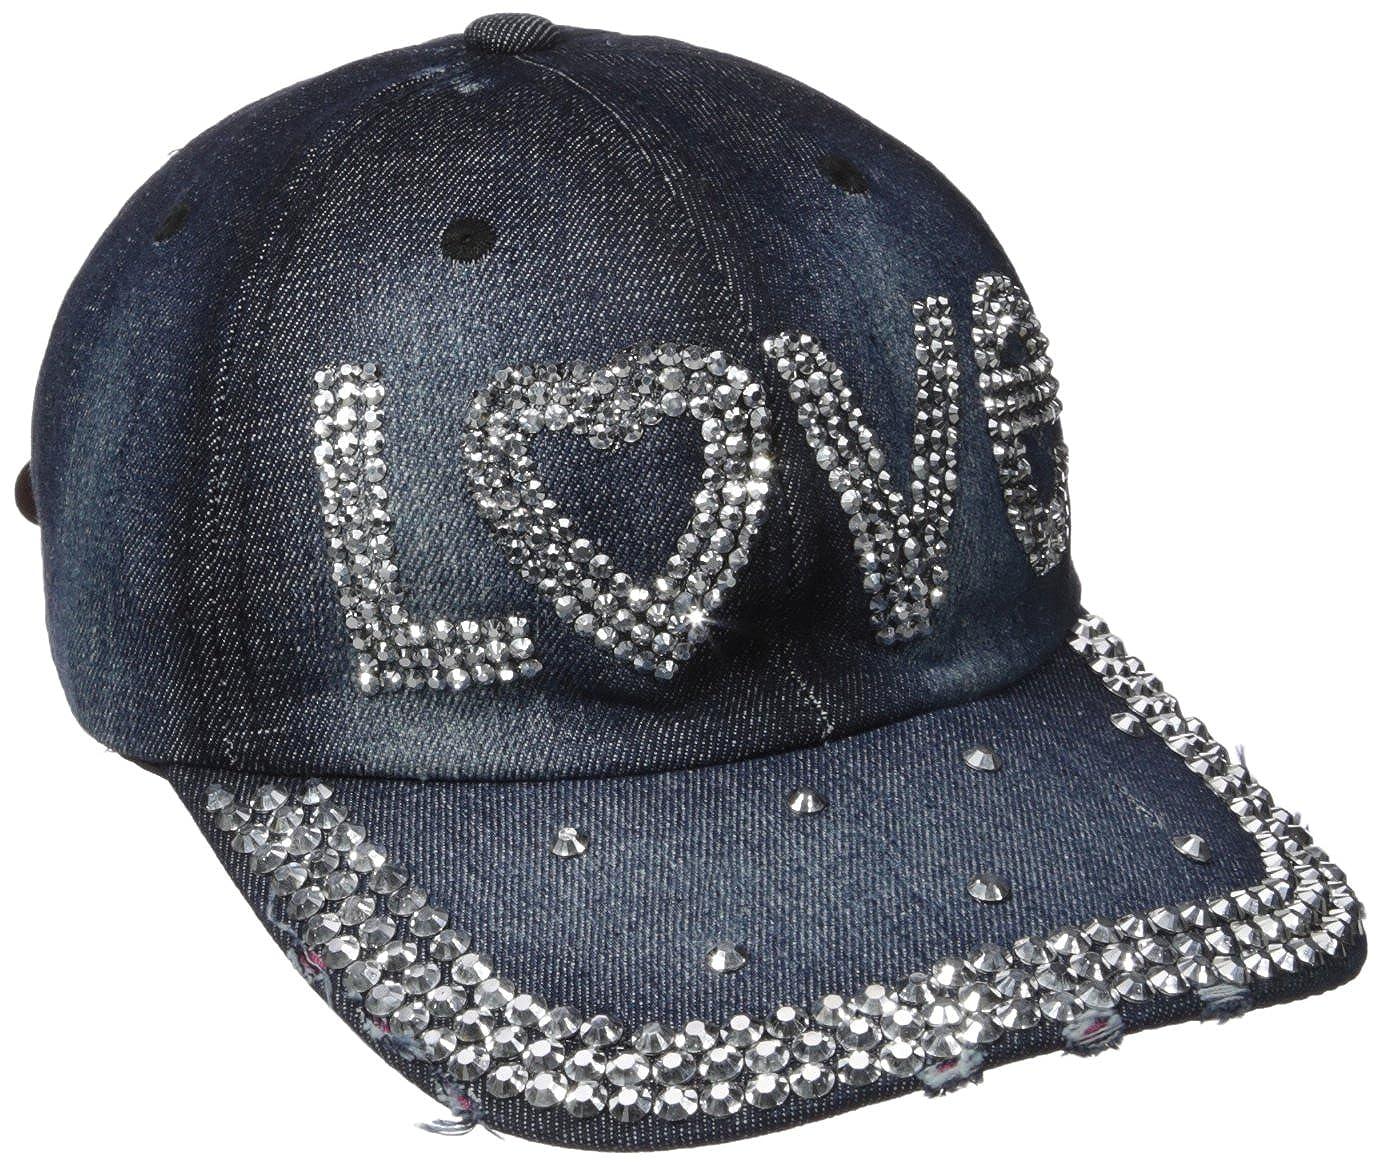 NYC Underground Women s Distressed Denim Baseball Hats with Rhinestones 44365e8ea30